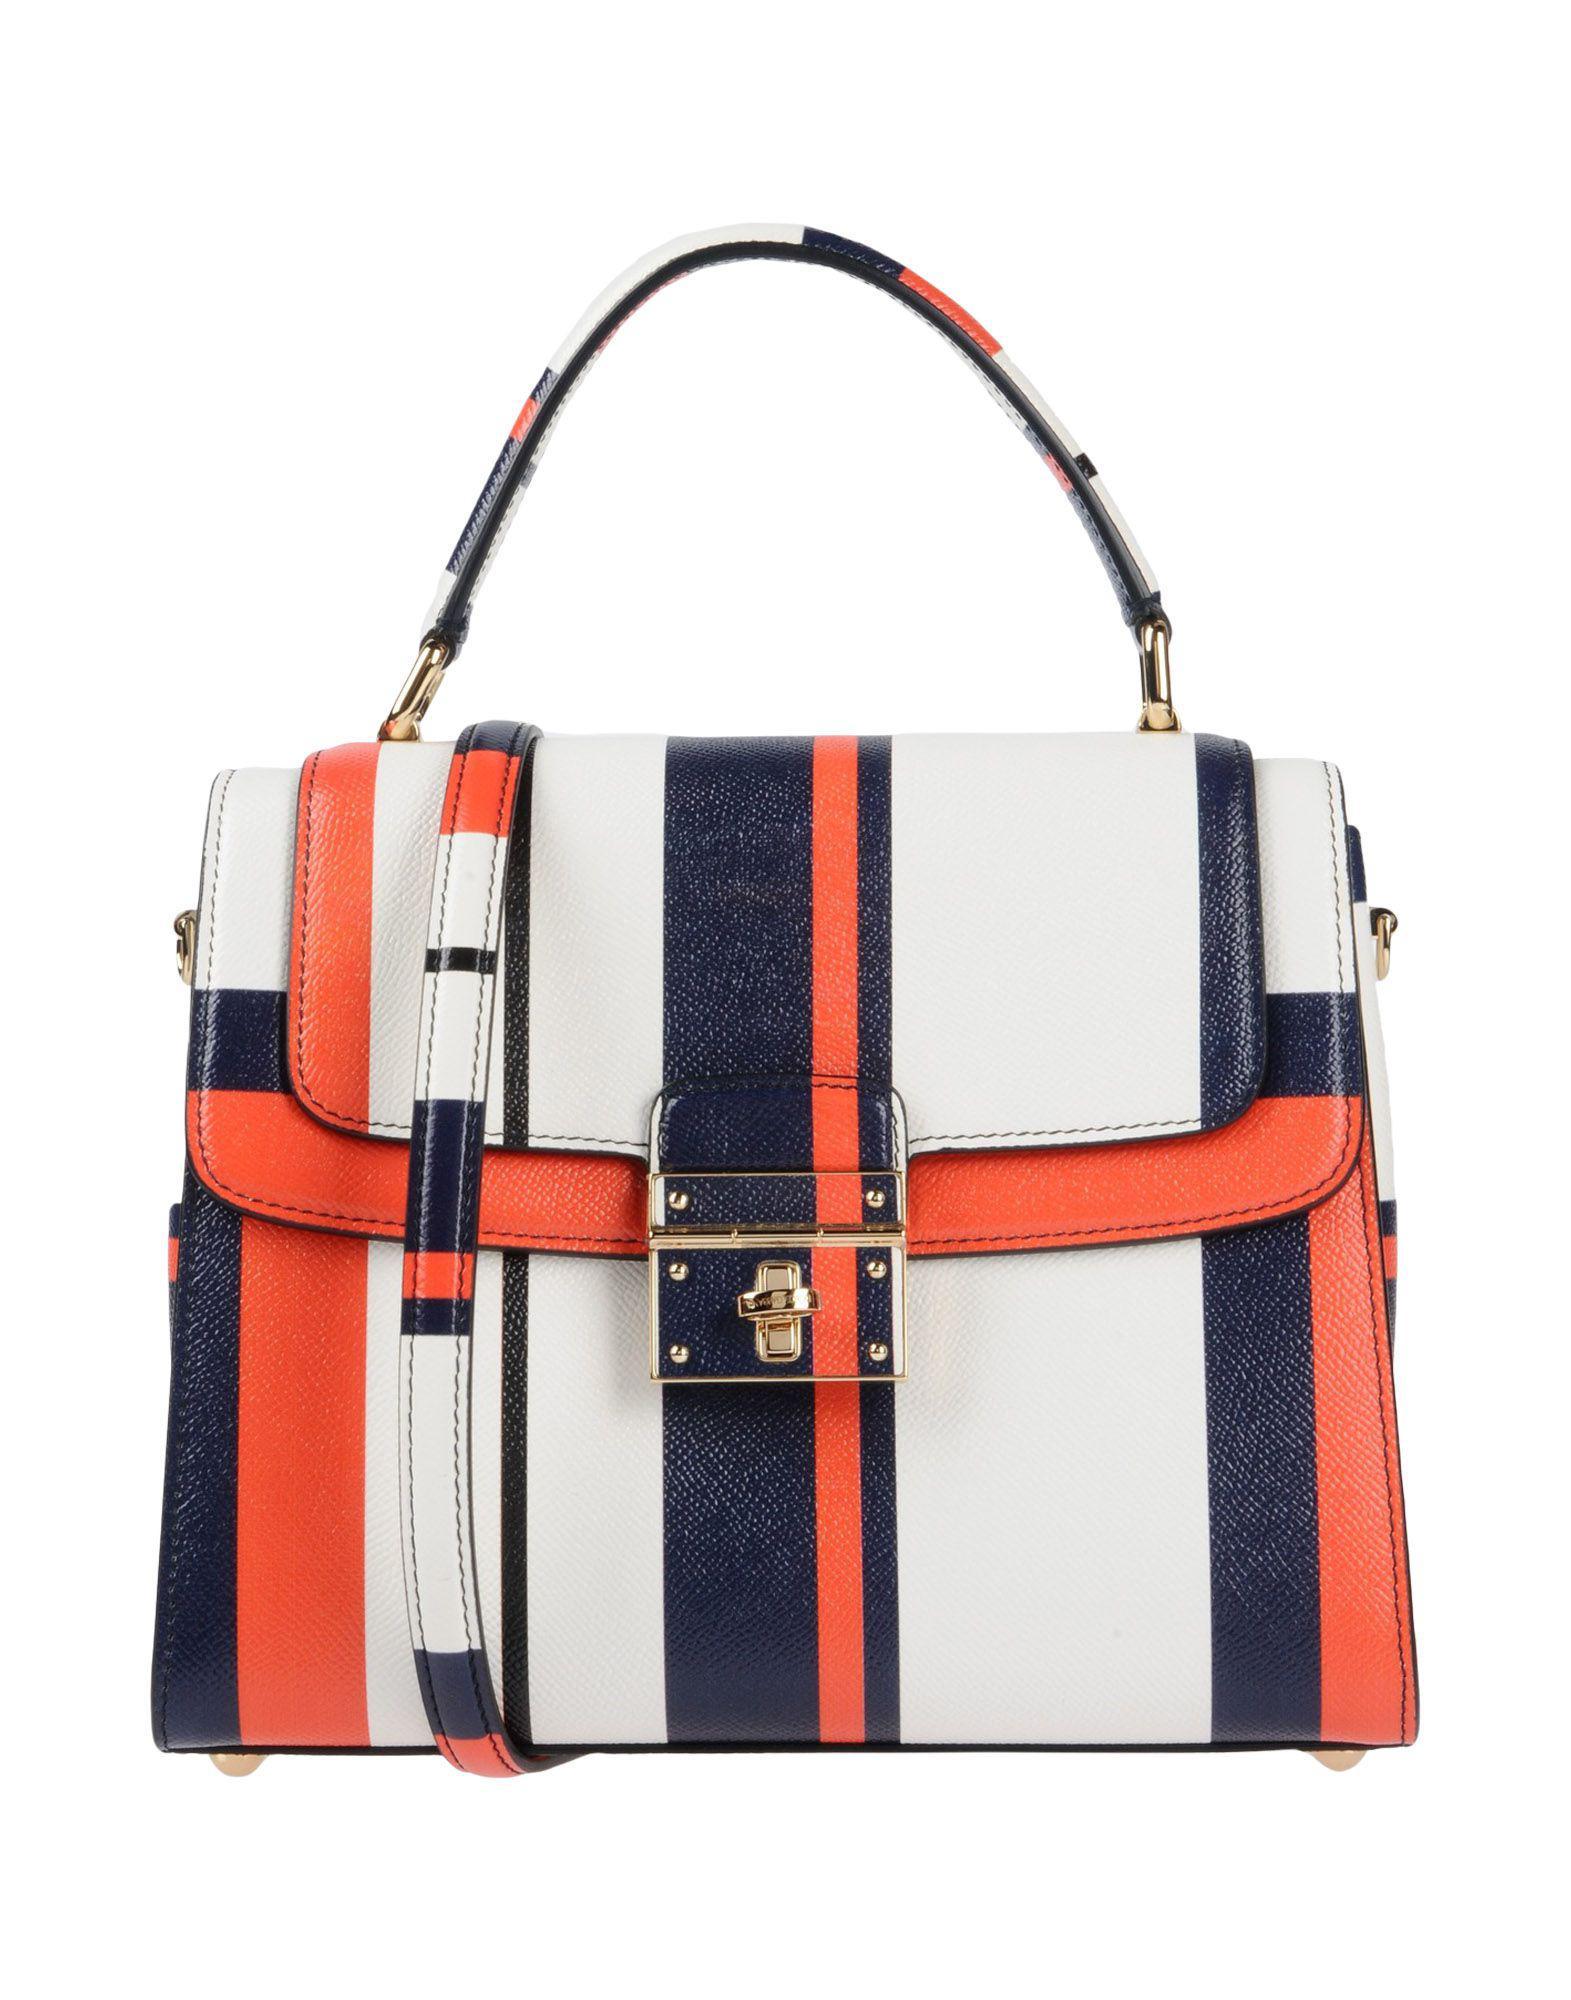 5fbd9215b25c Lyst - Dolce   Gabbana Handbag in White